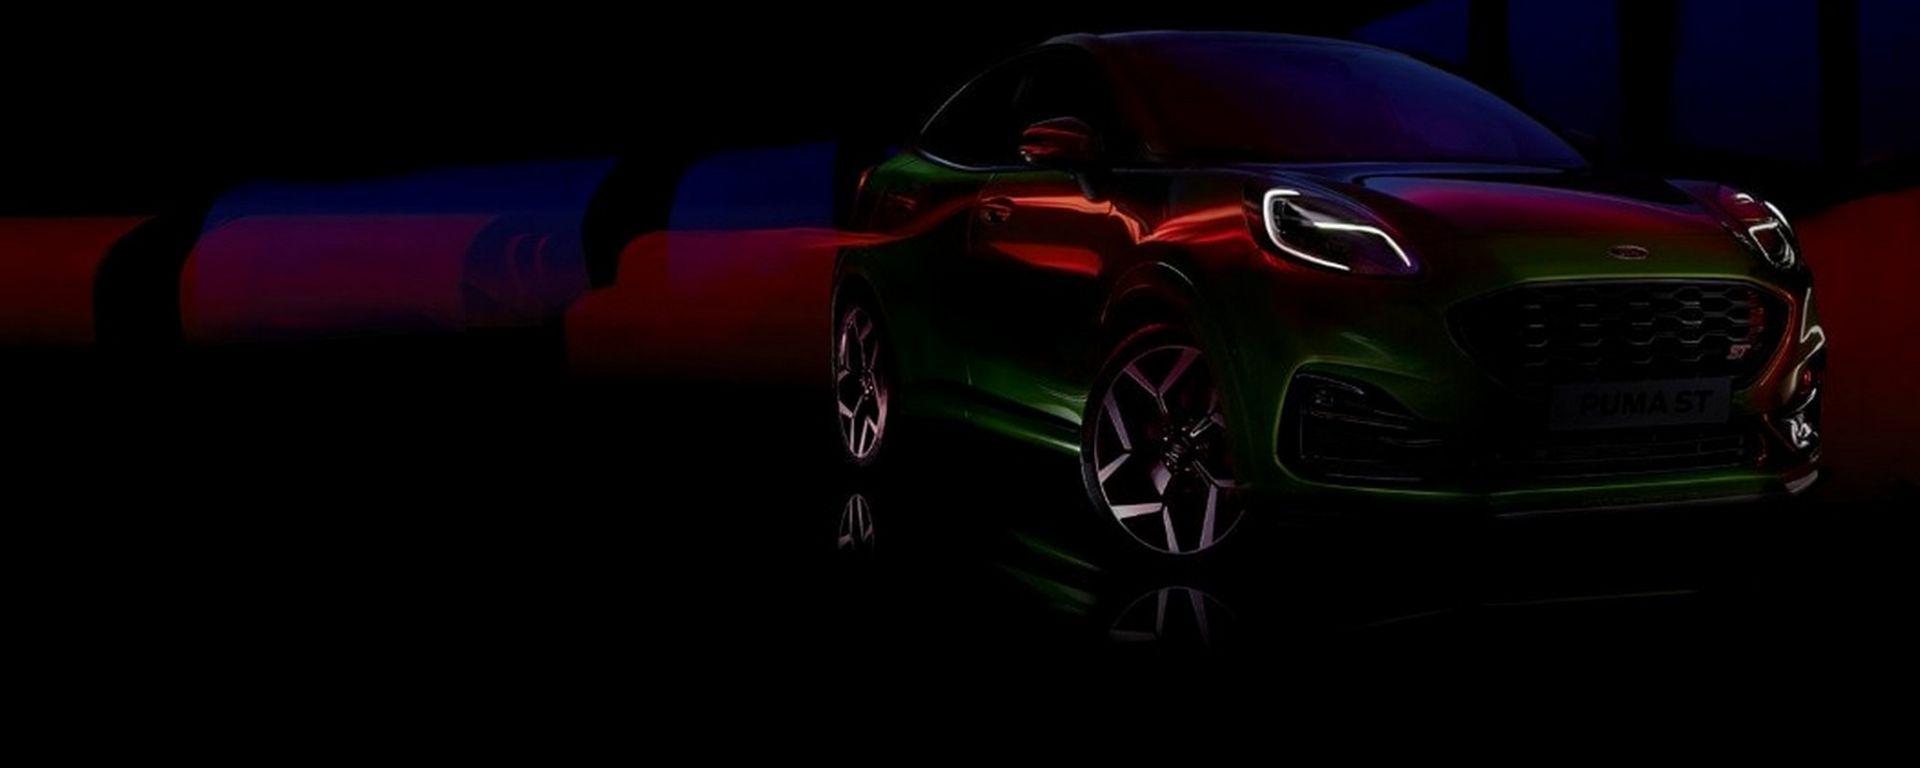 Nuova Ford Puma ST, il teaser ufficiale